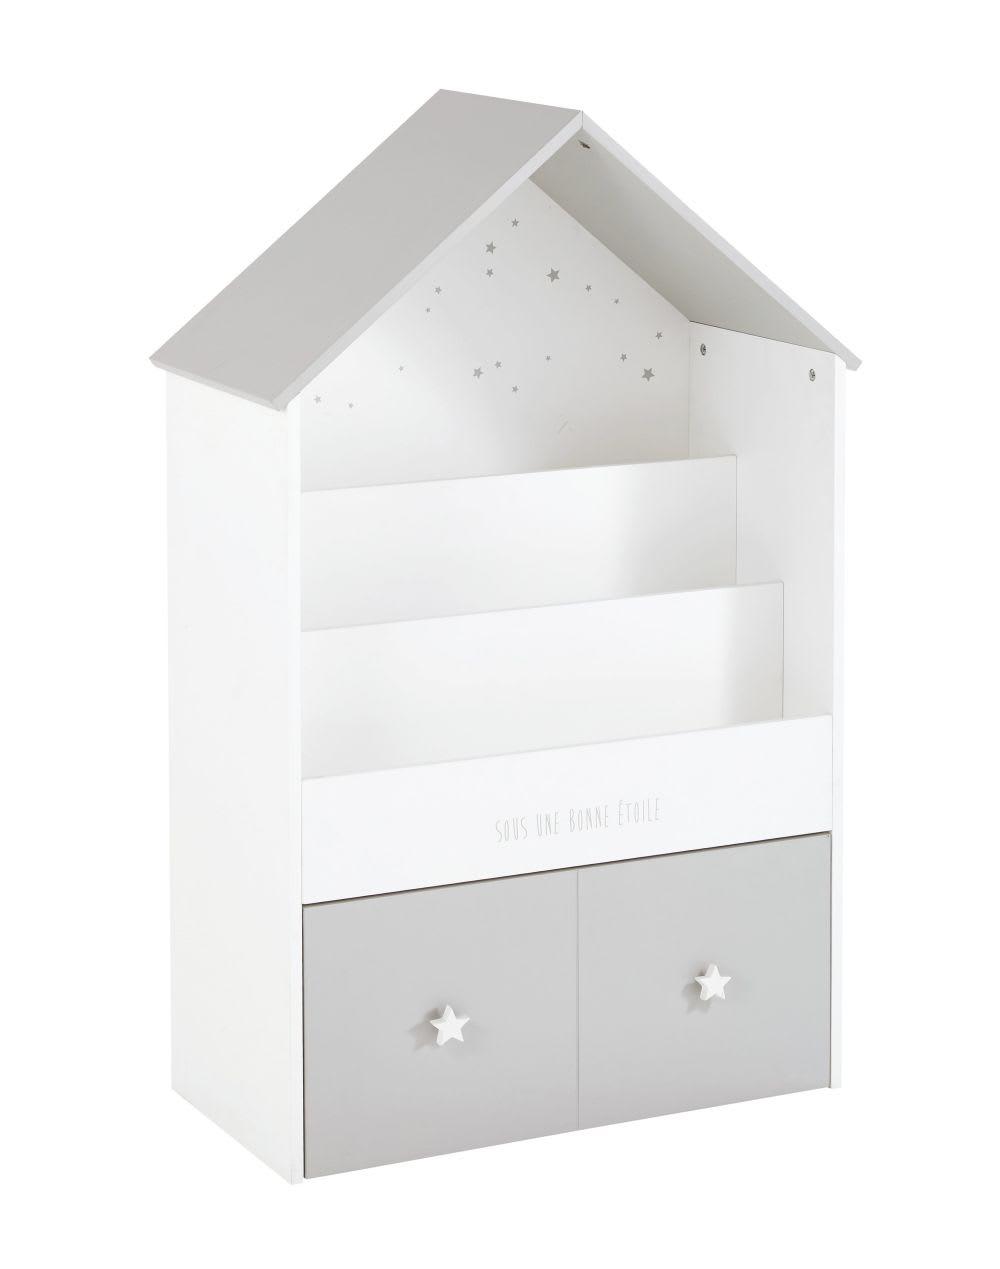 b cherregal in hausform f r kinder mit 1 schublade grau. Black Bedroom Furniture Sets. Home Design Ideas